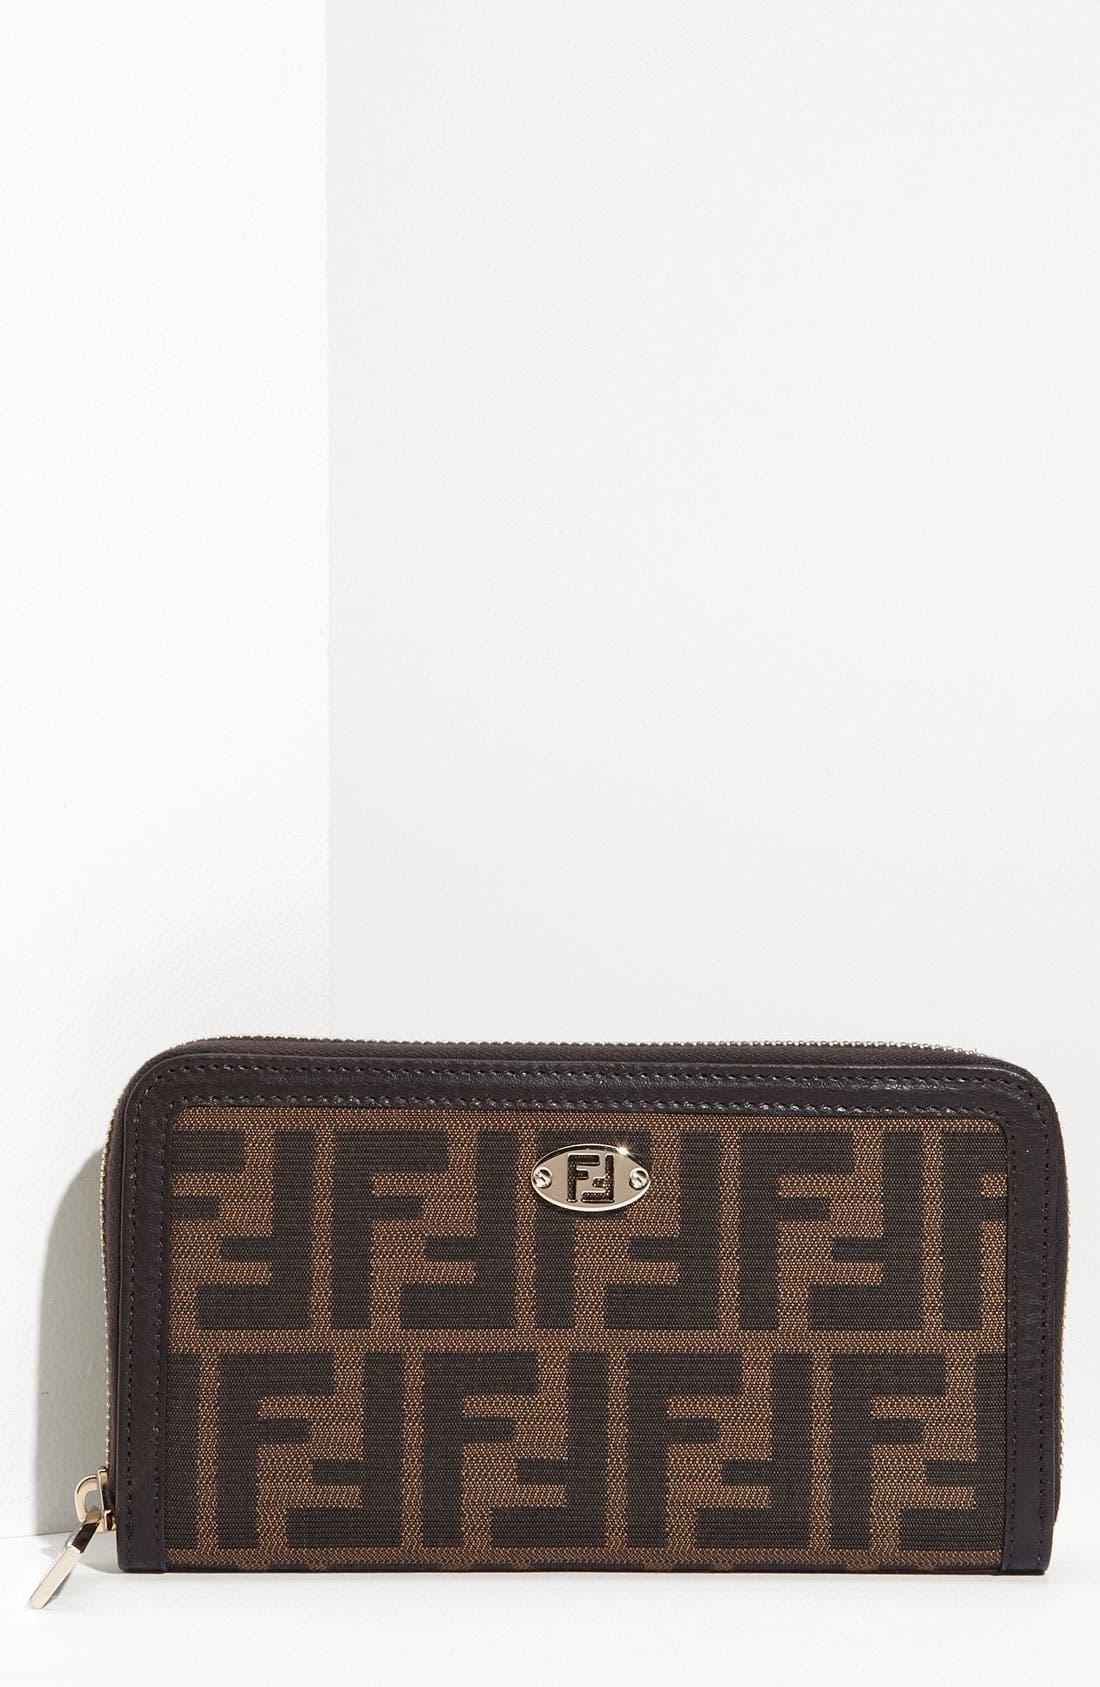 'Zucca' Zip Around Wallet,                             Main thumbnail 1, color,                             240